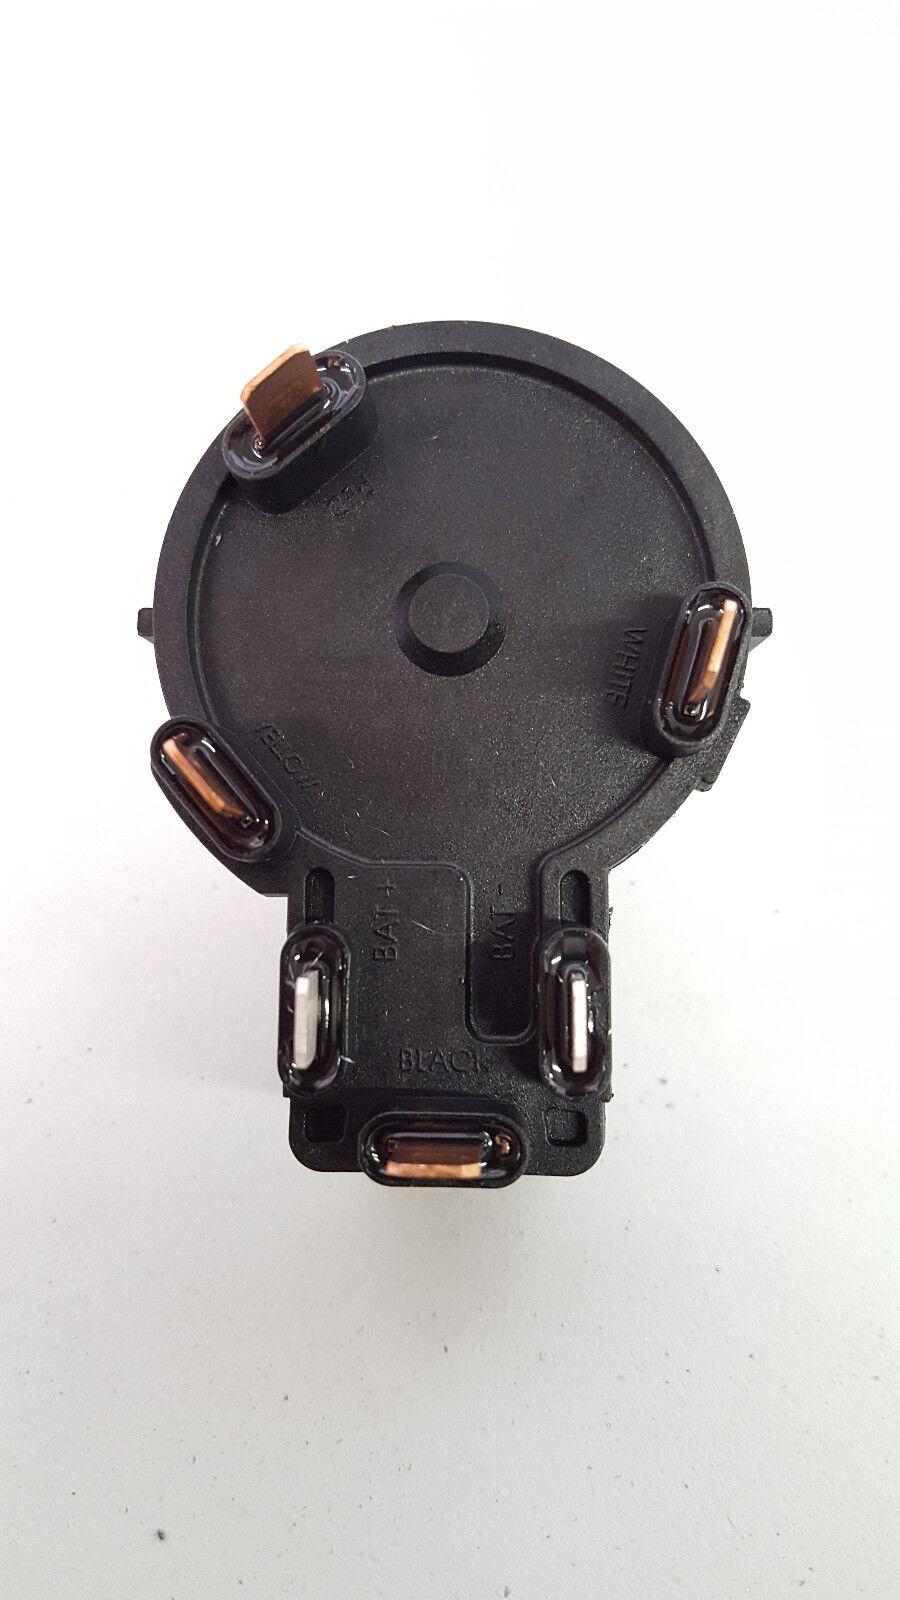 Boat Parts Motors Engines Components Trolling Attwood Motor Plug Wiring Diagram New Minn Kota 5 Speed Switch 2064028 Foward Reverse